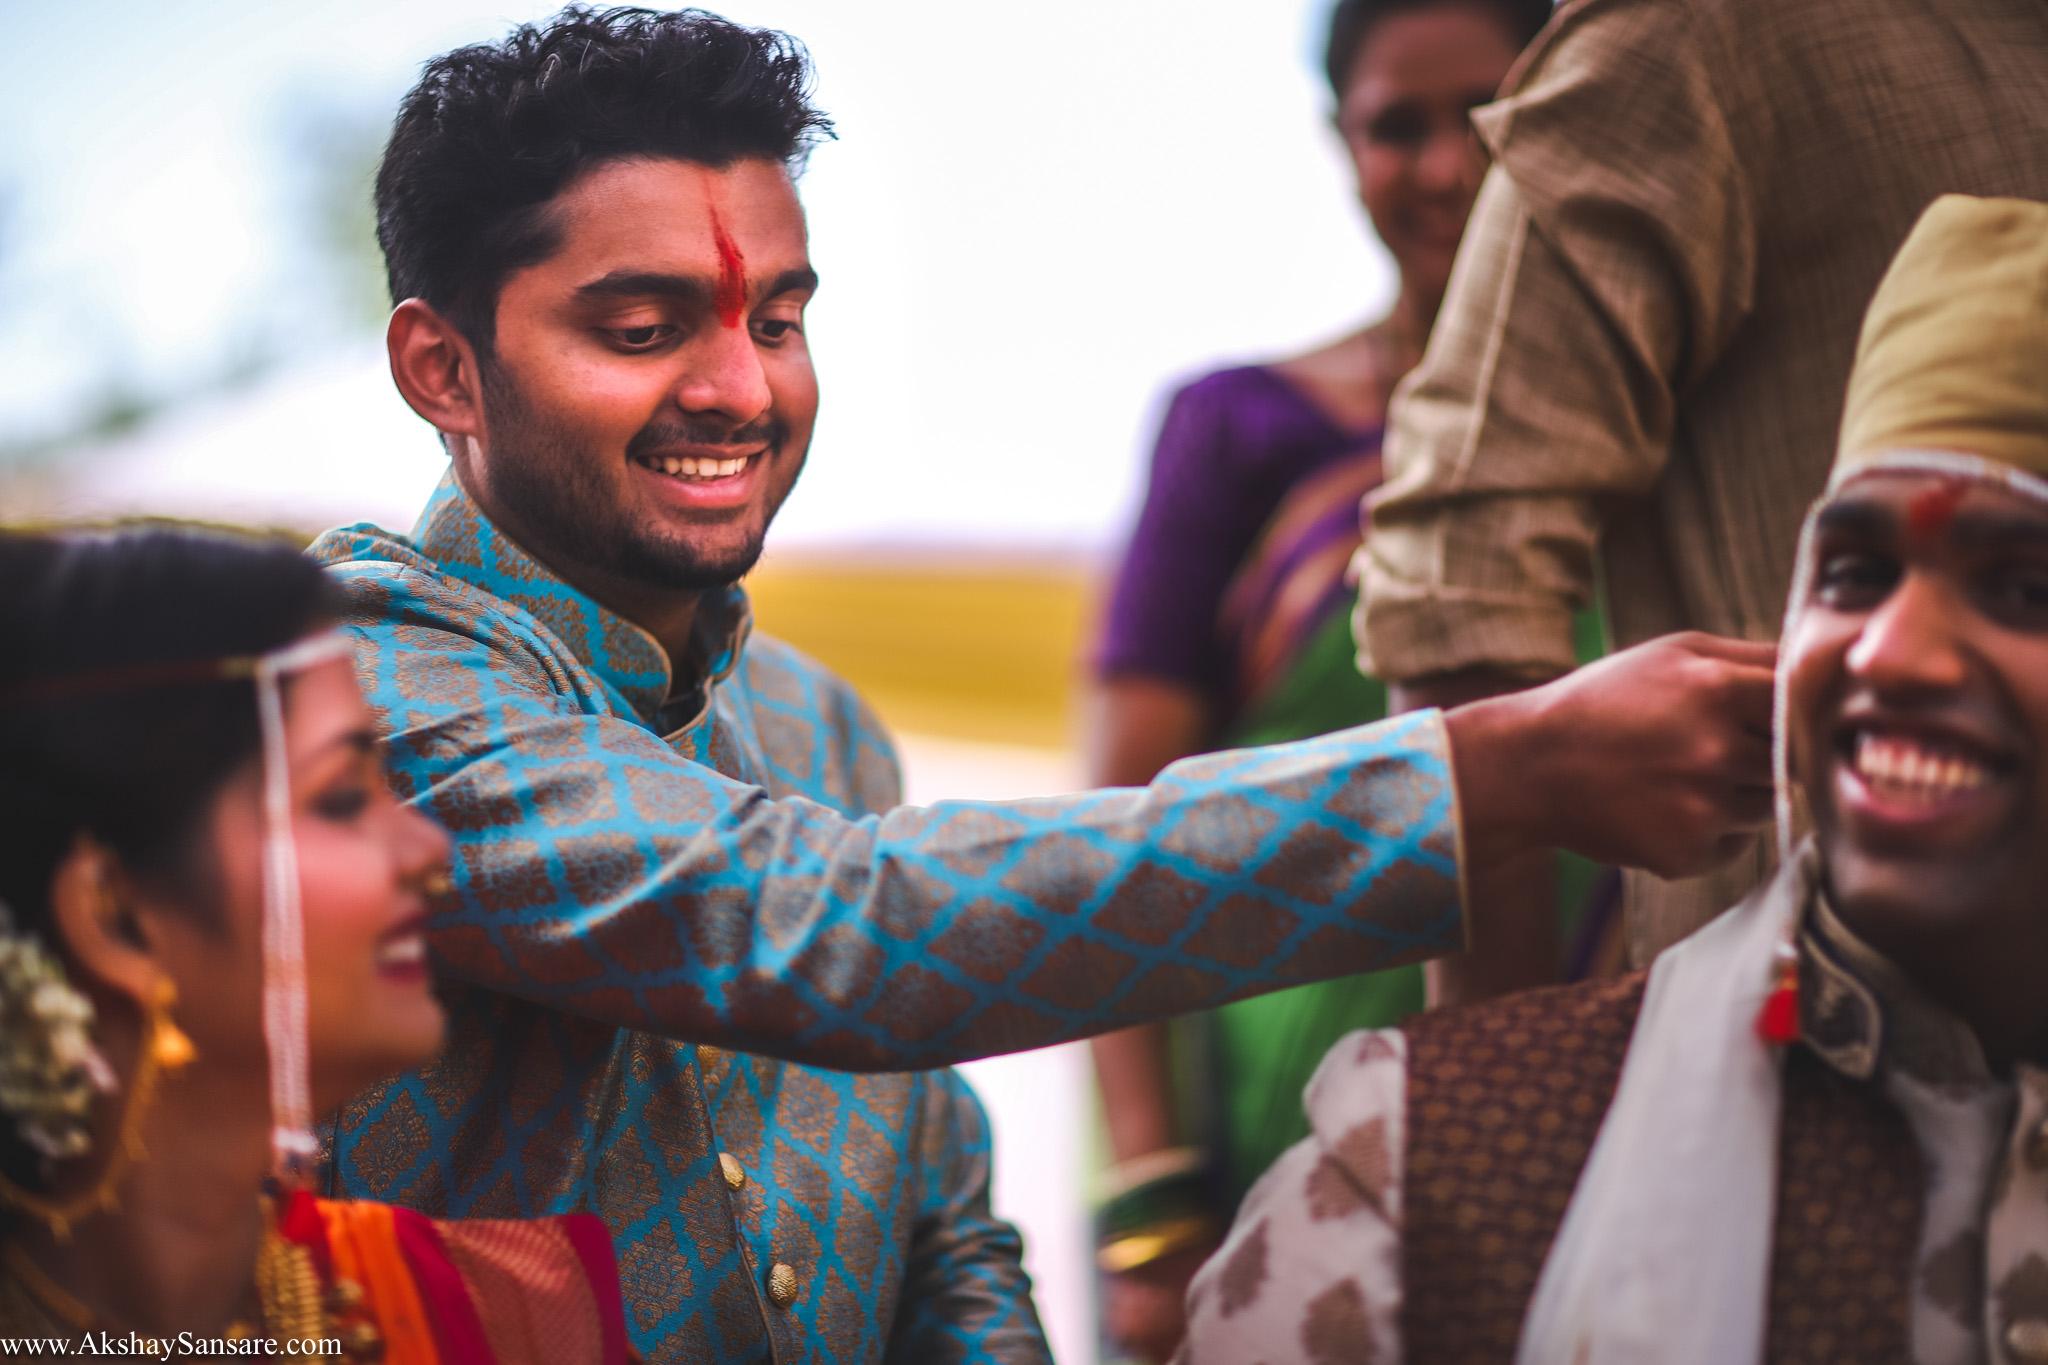 Salil x Kimaya Akshay Sansare Photography Candid wedding Photographer in mumbai best(24).jpg